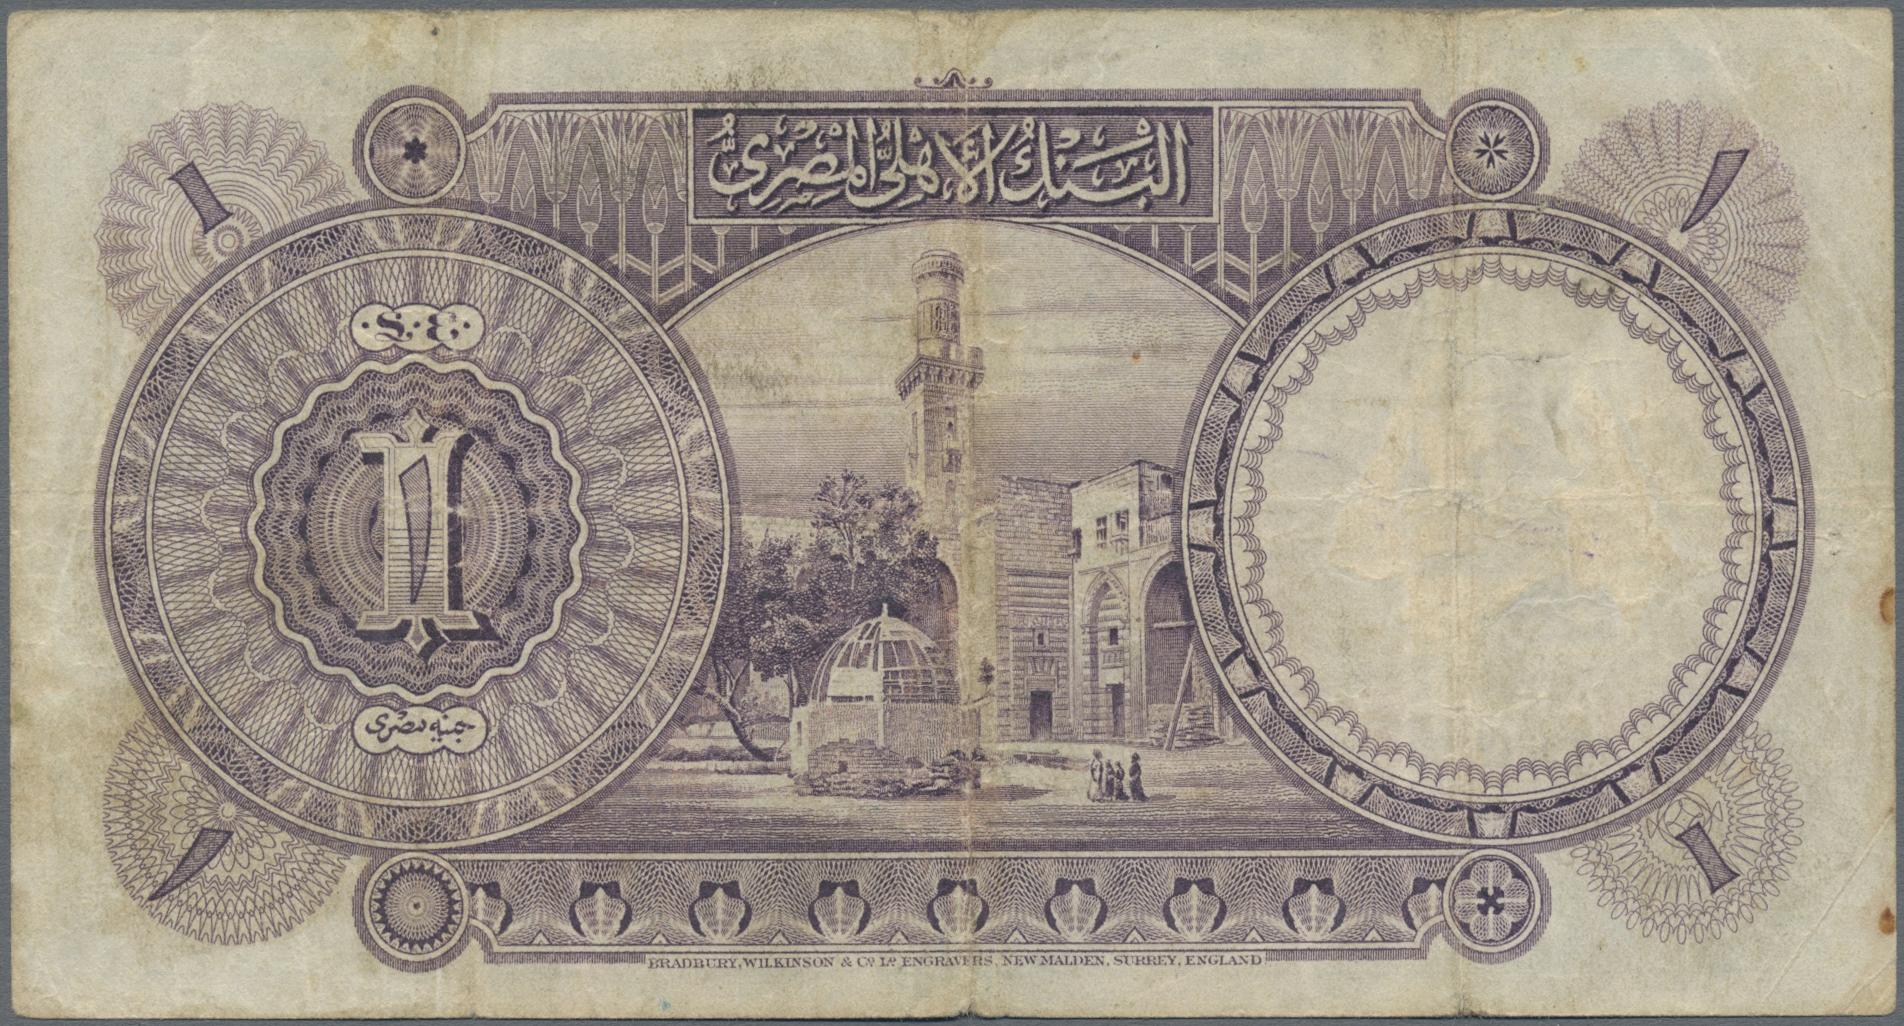 Lot 00196 - Egypt / Ägypten | Banknoten  -  Auktionshaus Christoph Gärtner GmbH & Co. KG Sale #48 The Banknotes